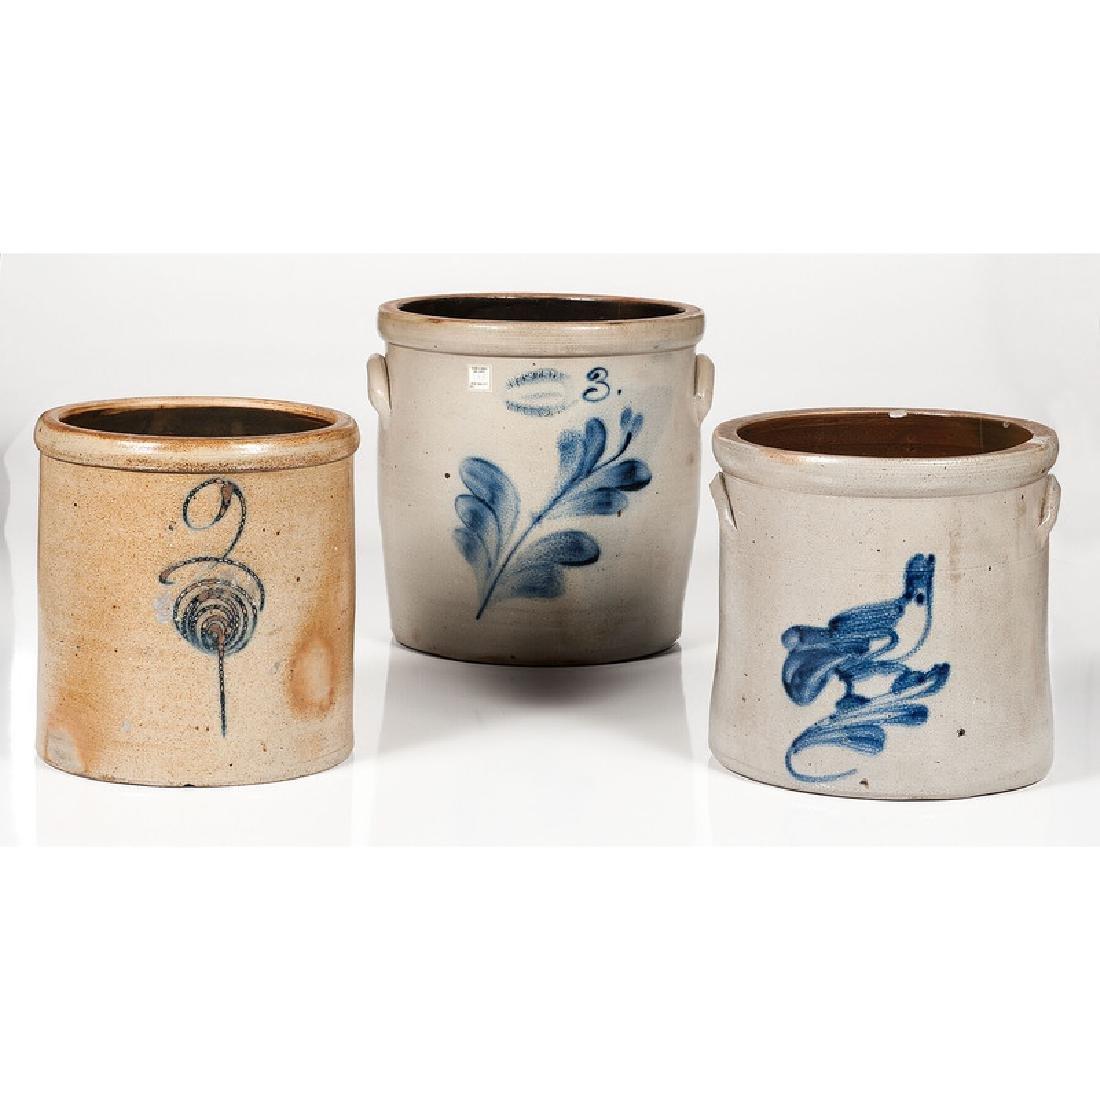 Cobalt Decorated Stoneware Crocks, Including J. Fisher